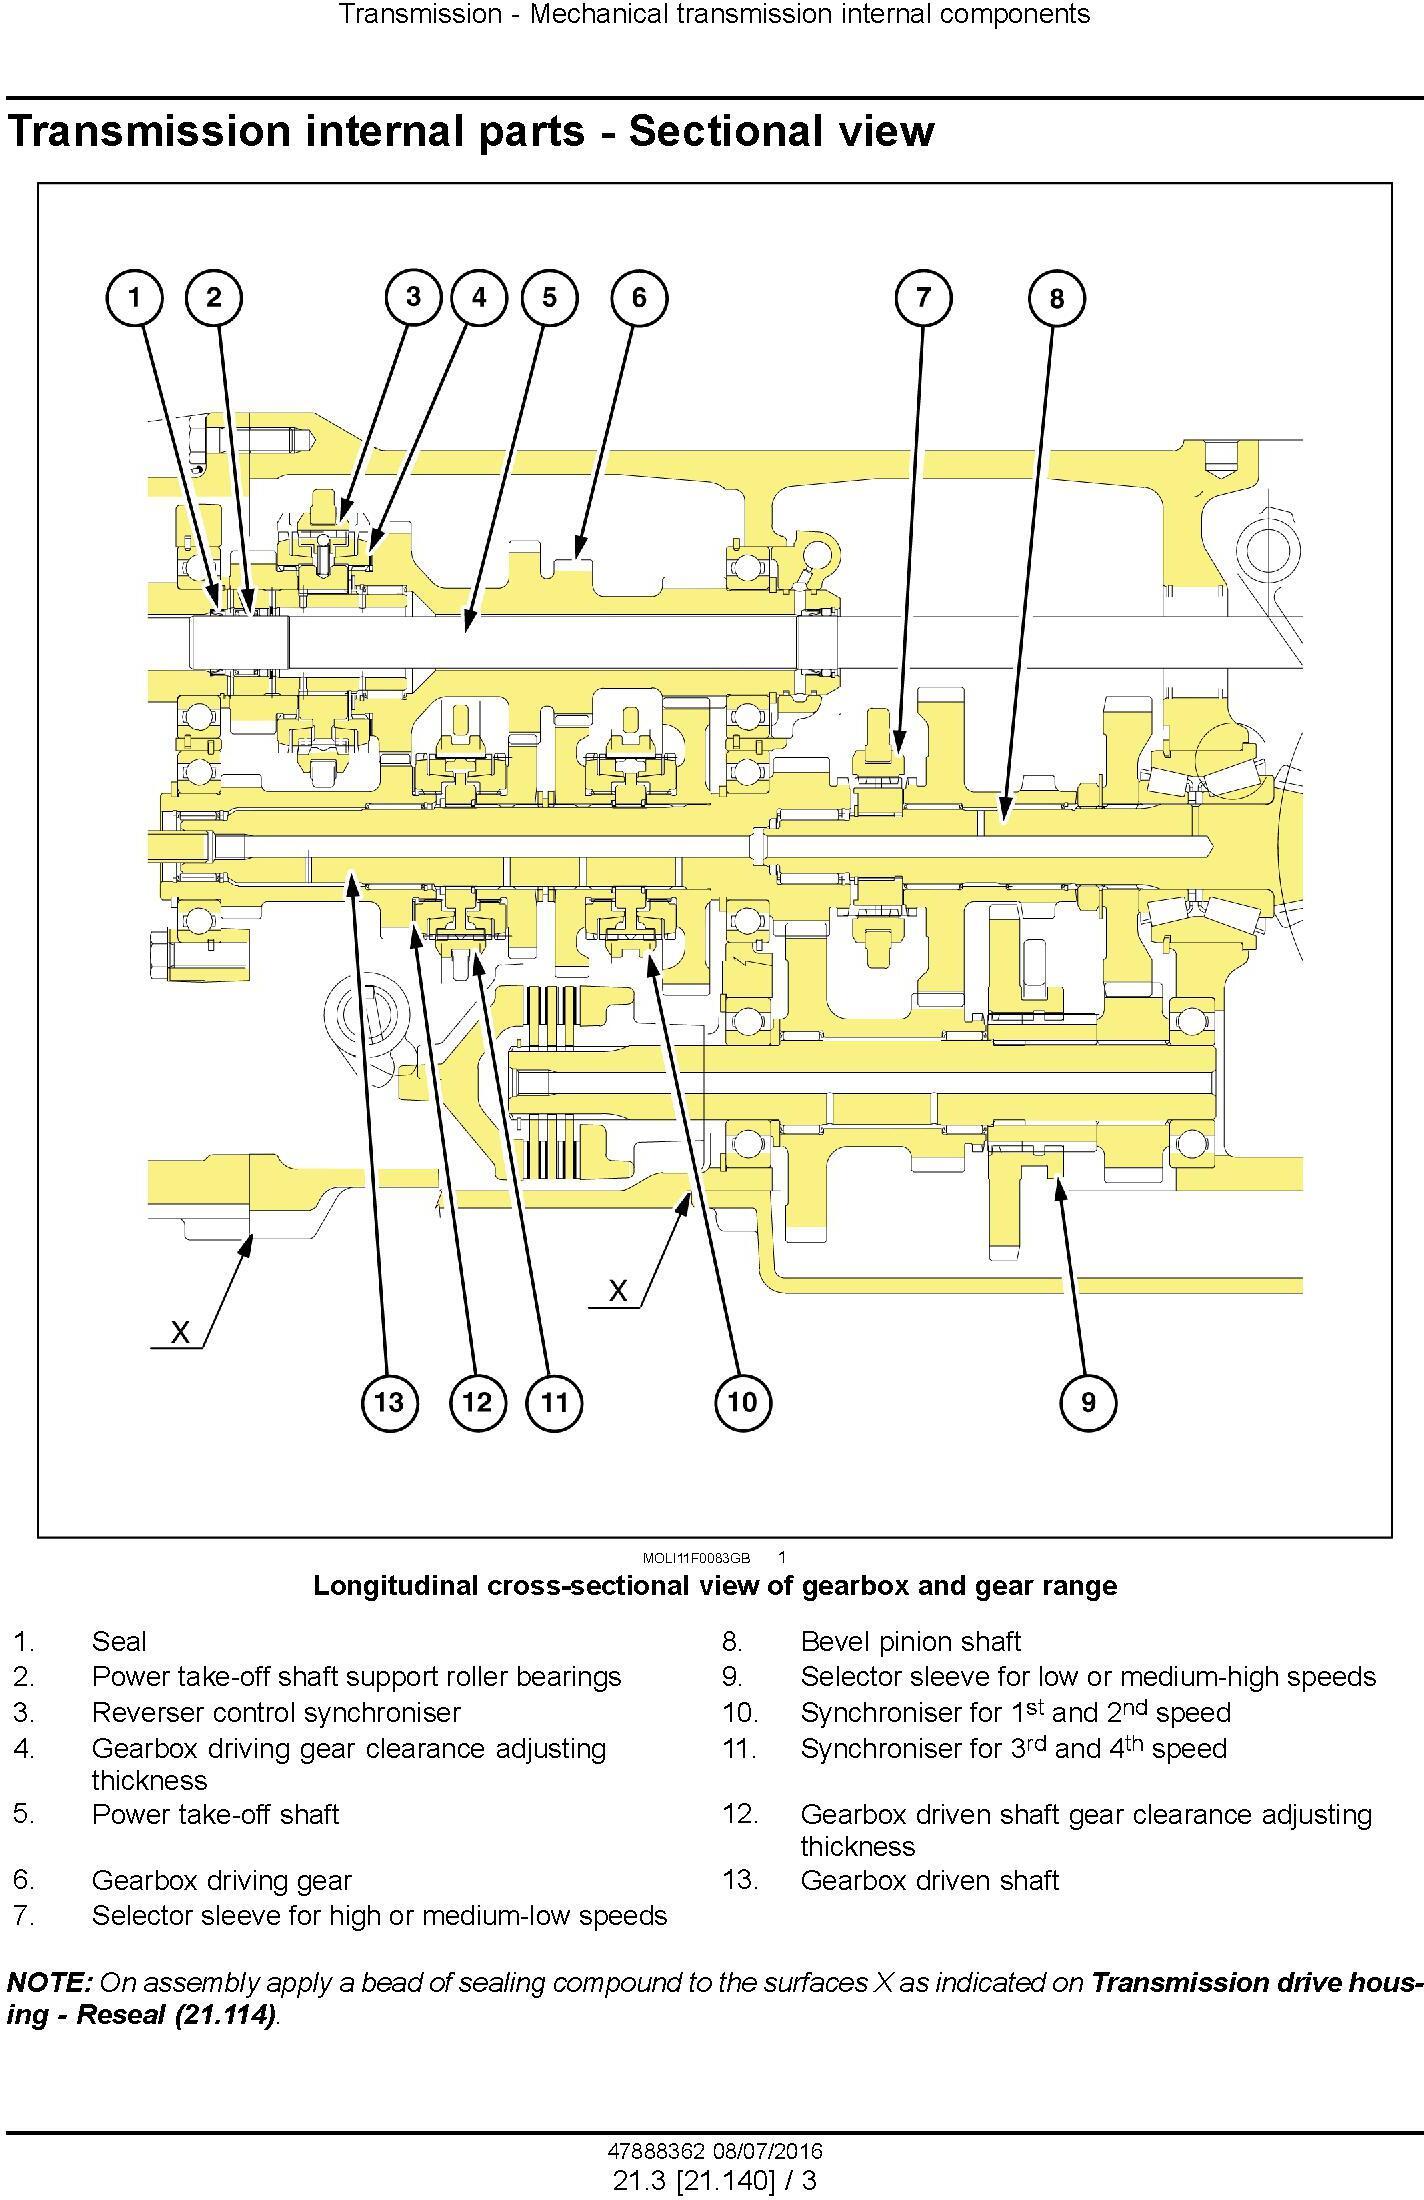 New Holland T4.75F, T4.85F, T4.95F, T4.105F Tier 3 Tractor Complete Service Manual (North America) - 2